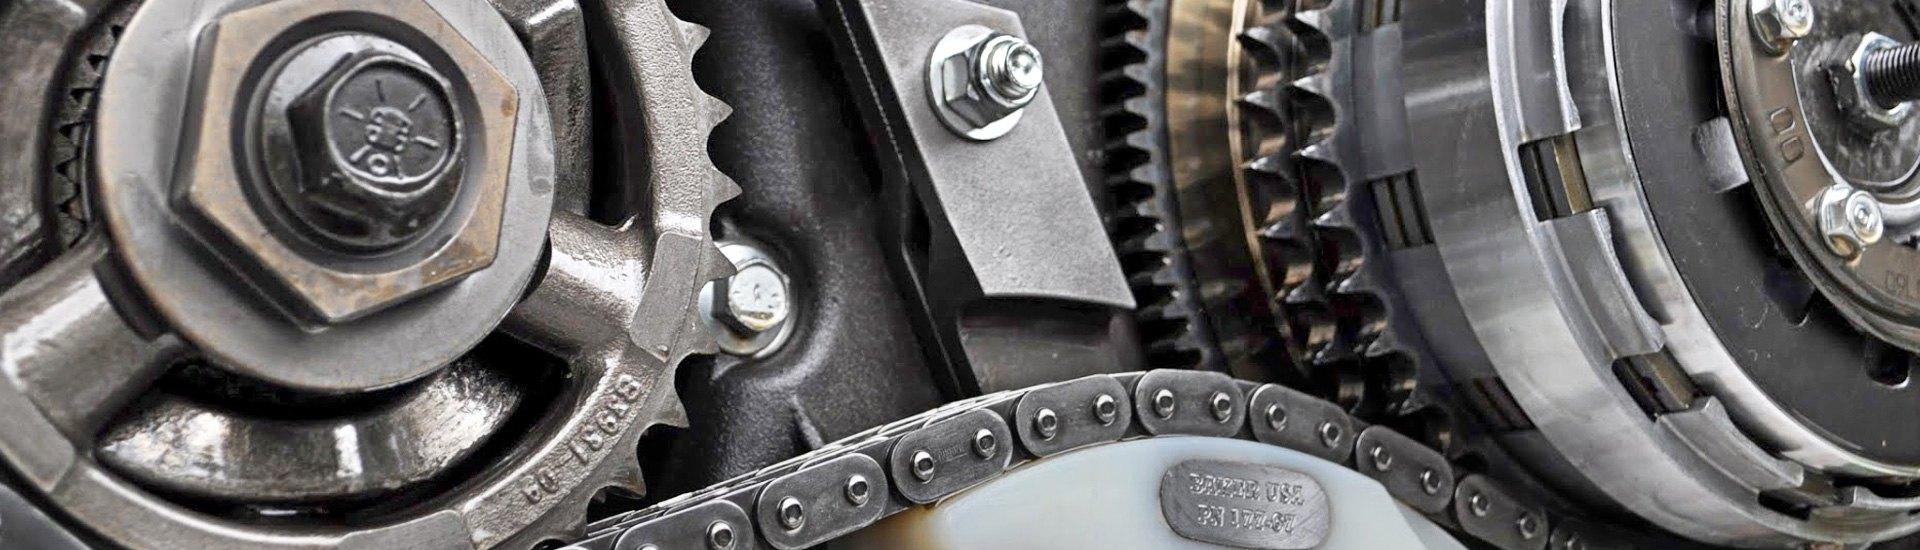 Motorcycle Drivetrain & Transmission Parts